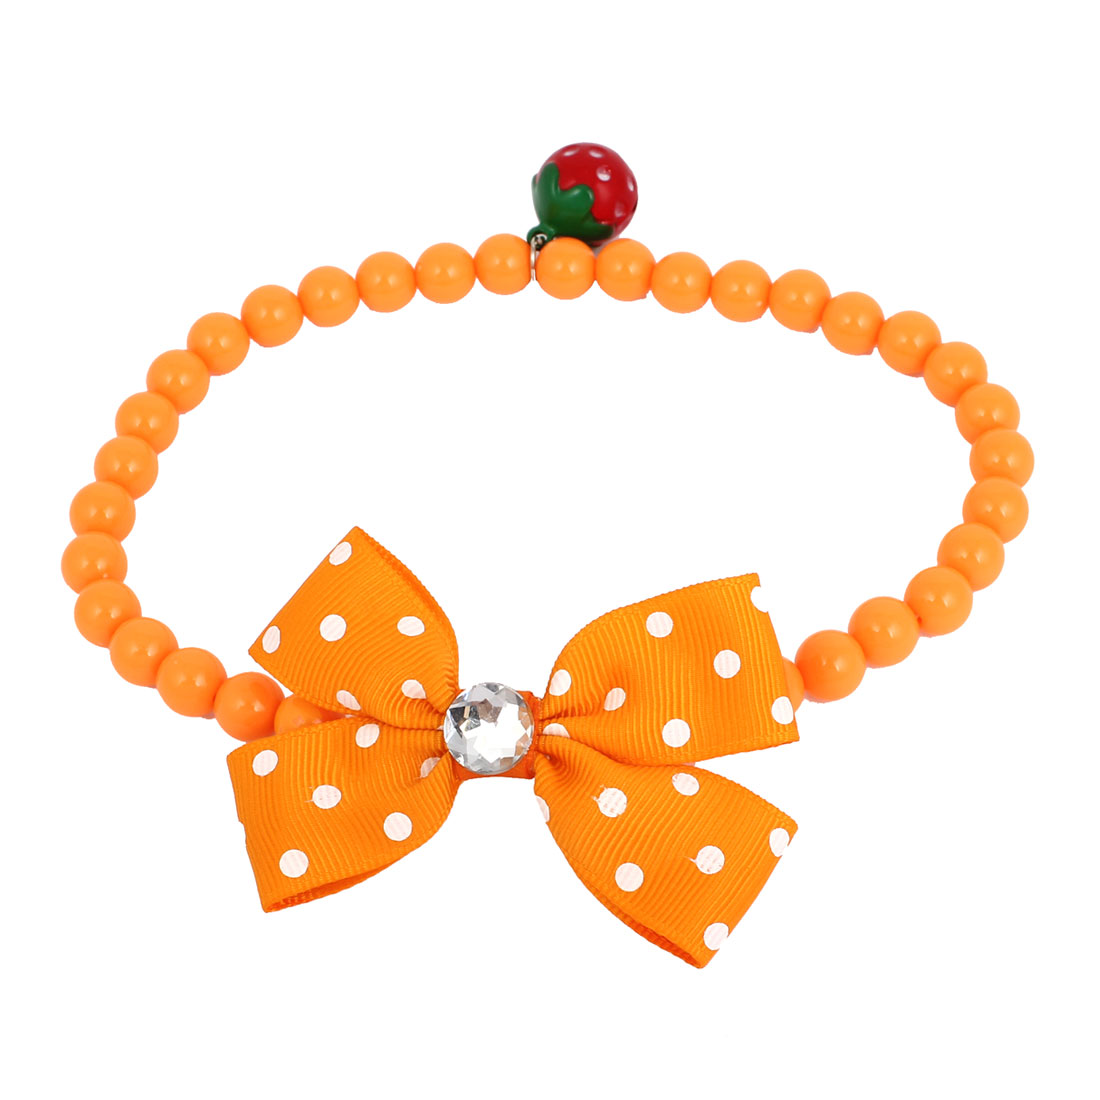 Metal Bell Pendant Bowtie Accent Pet Dog Plastic Round Beads Collar Necklace Orange L